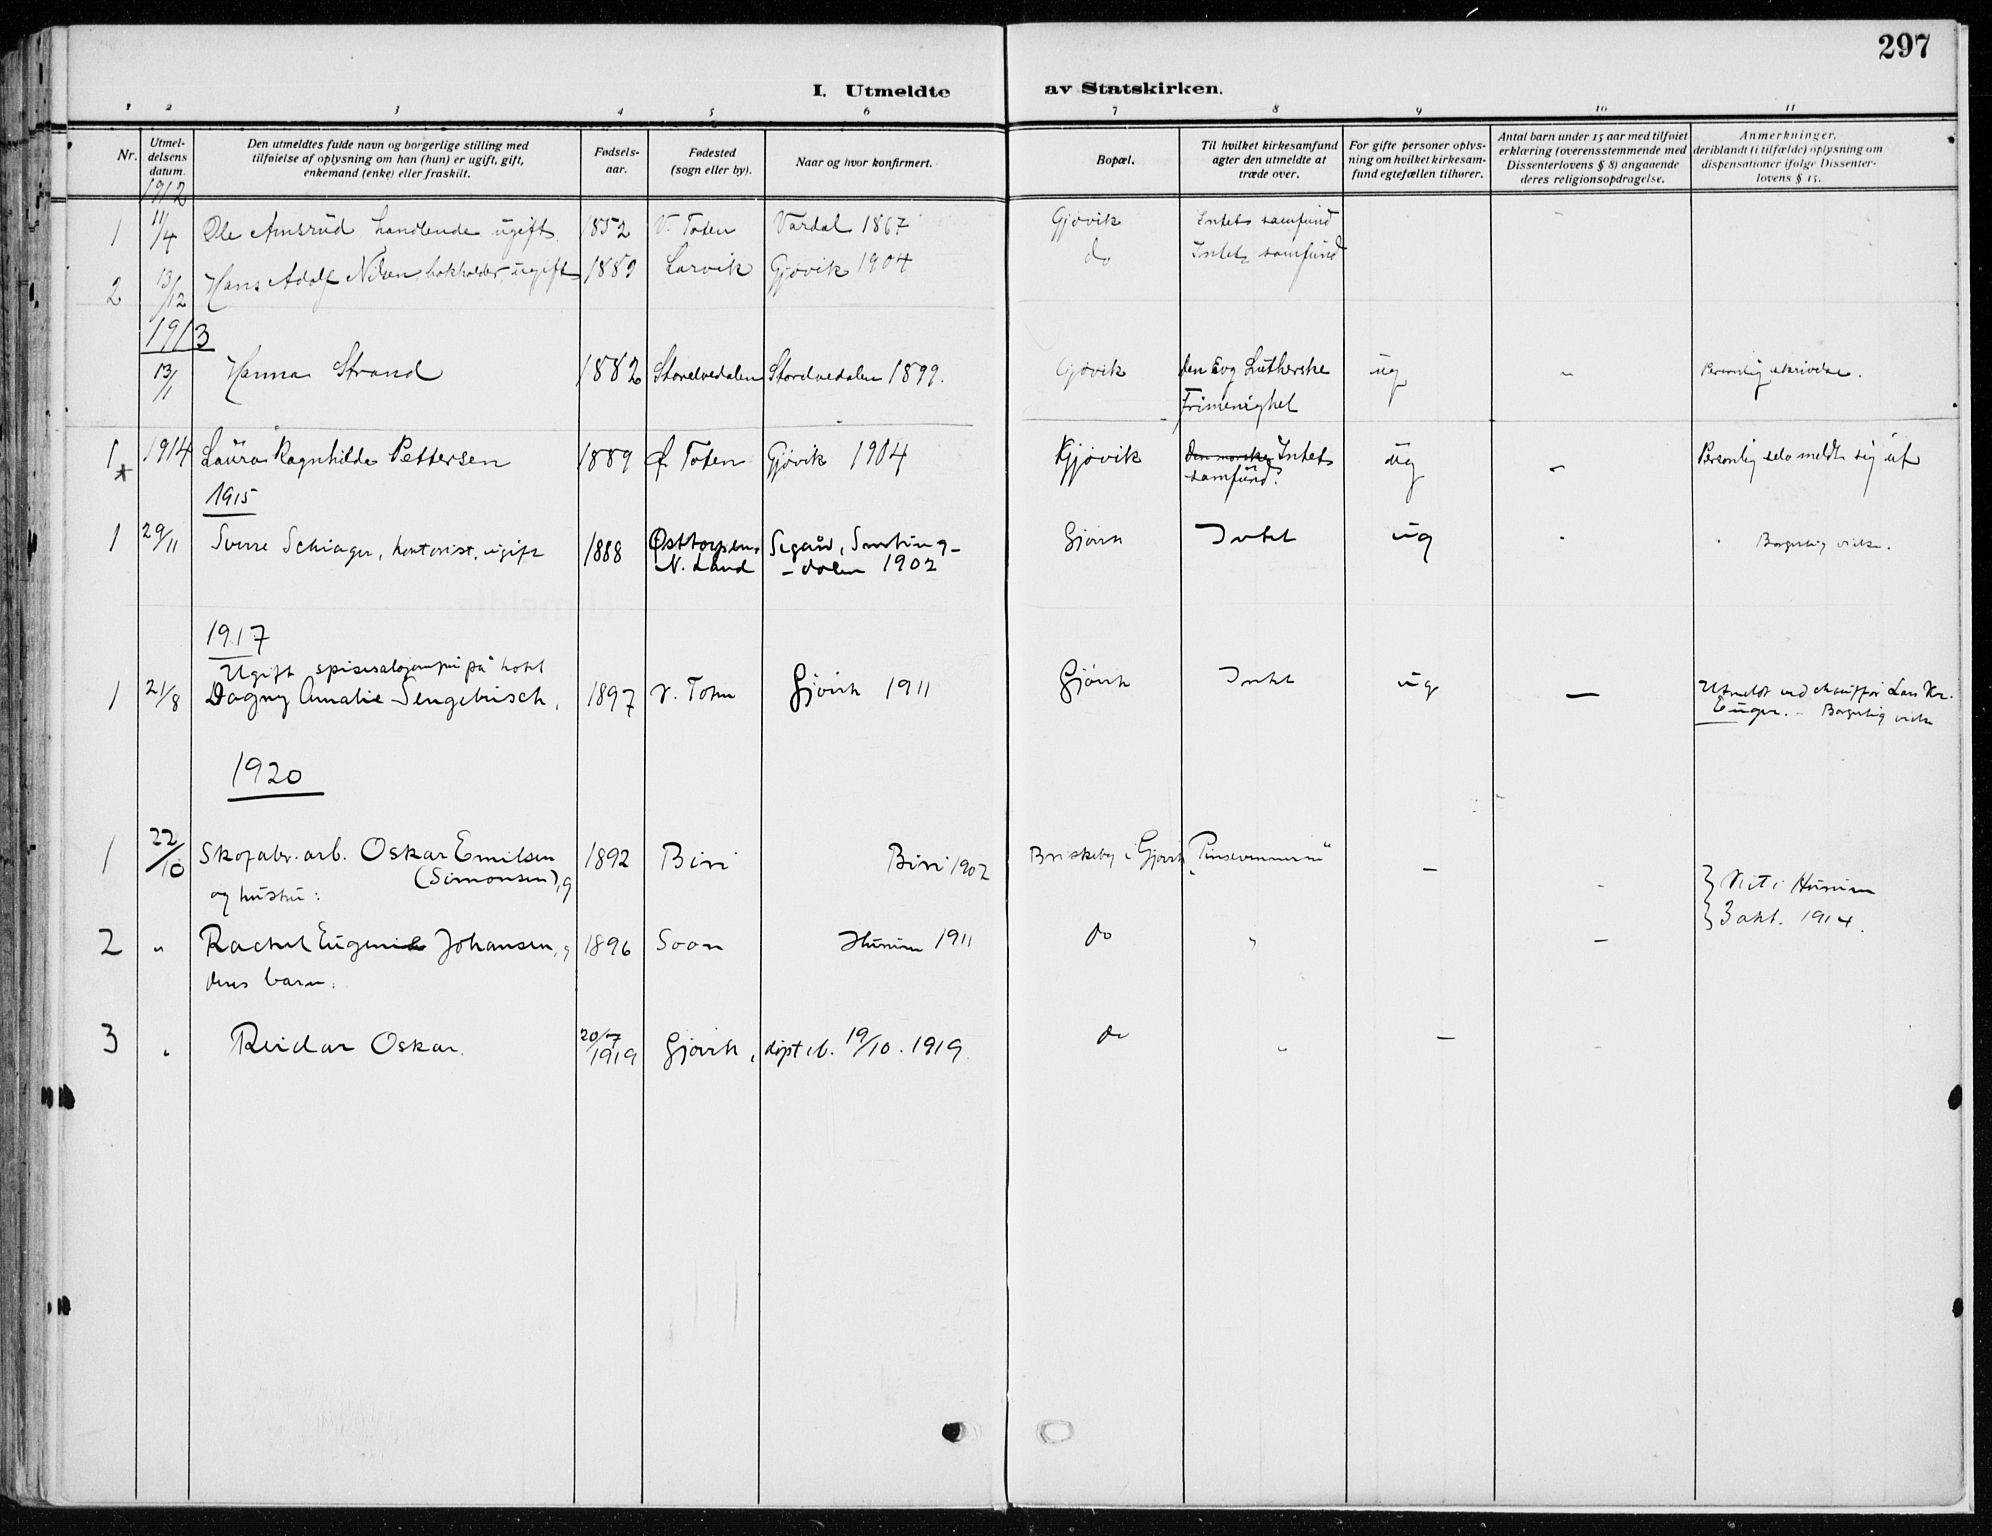 SAH, Vardal prestekontor, H/Ha/Haa/L0014: Ministerialbok nr. 14, 1912-1922, s. 297